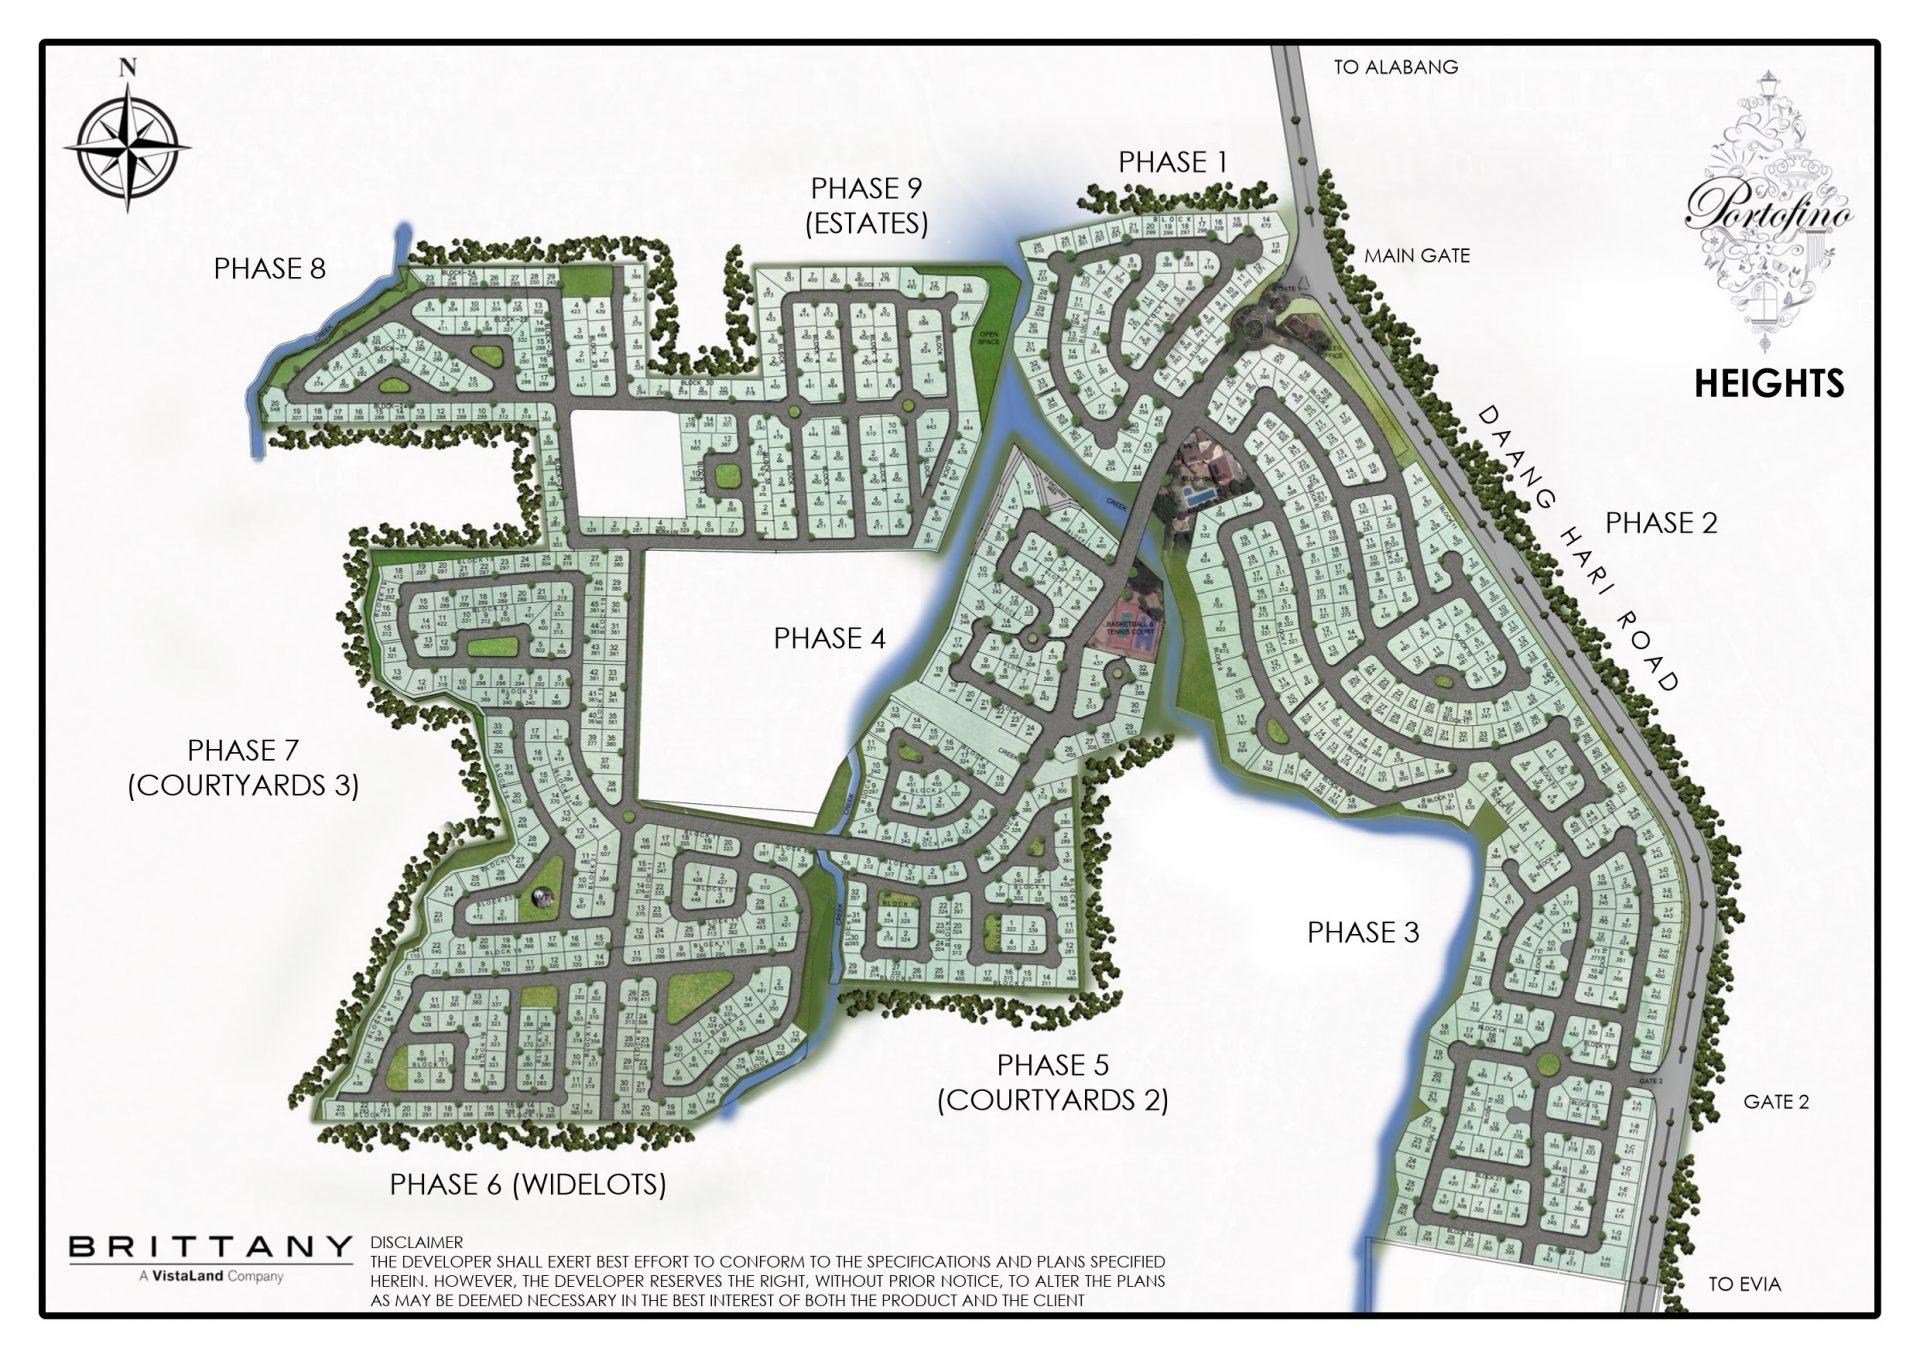 Portofino Heights - Site Development Plan - Master Plan Vista Alabang - Brittany Corporation